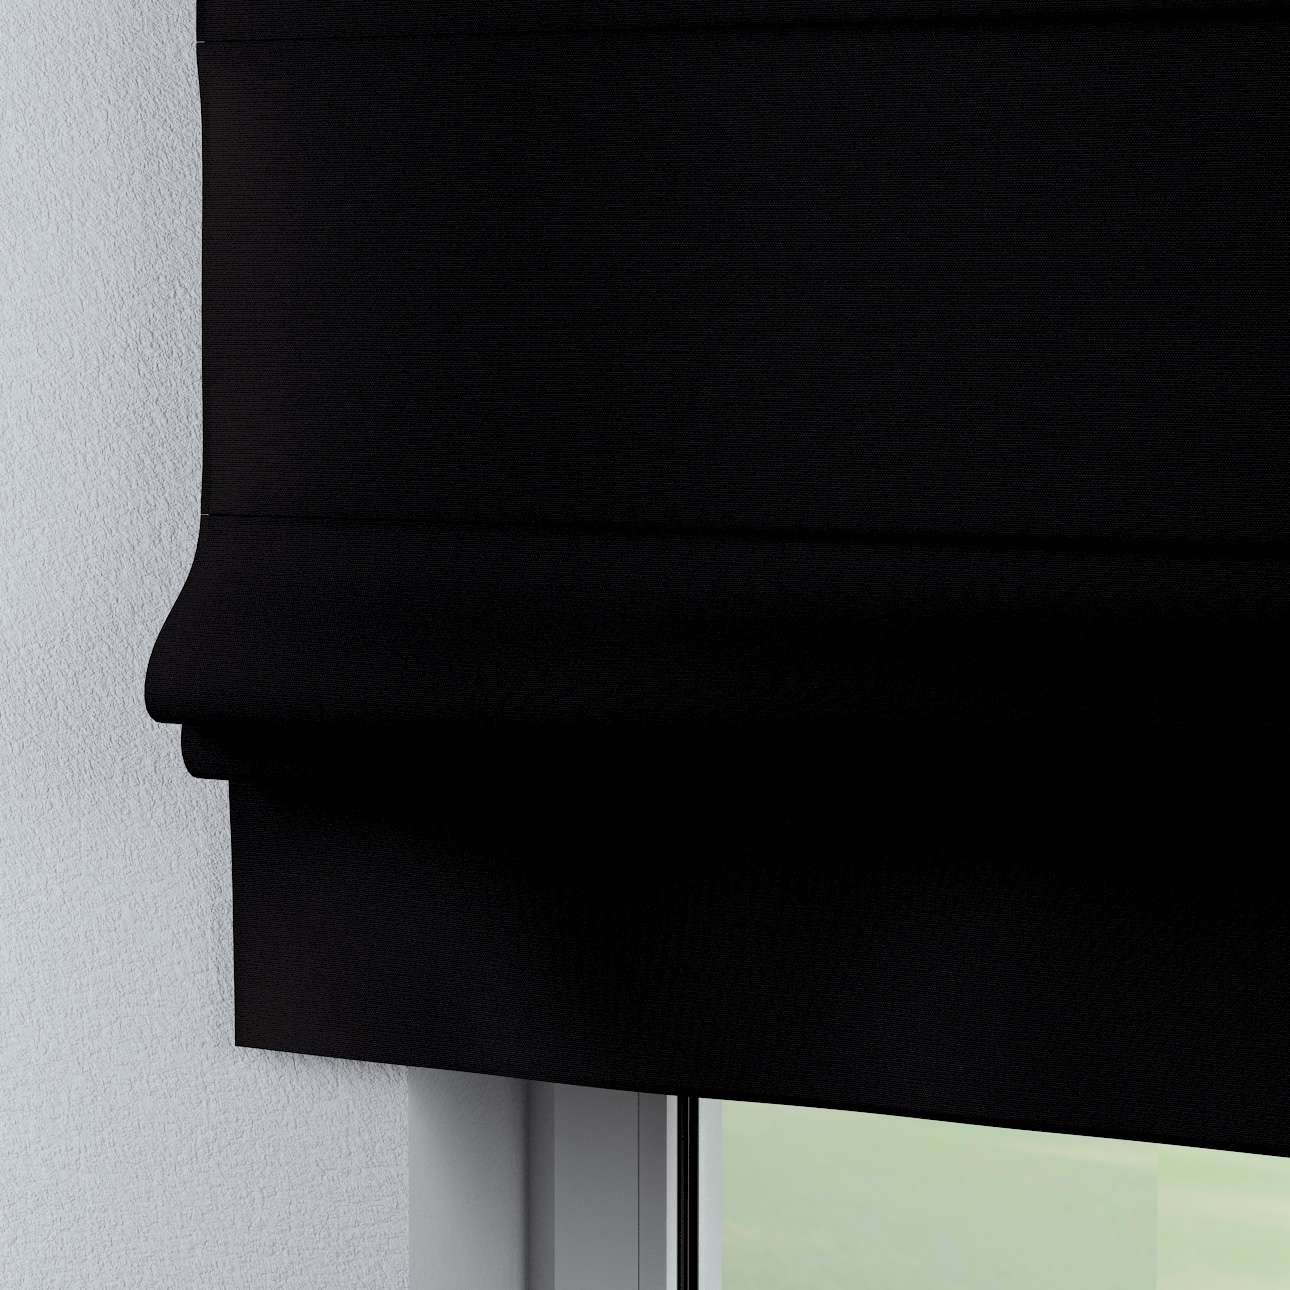 vouwgordijn Padva 80 x 170 cm van de collectie Cotton Panama, Stof: 702-09